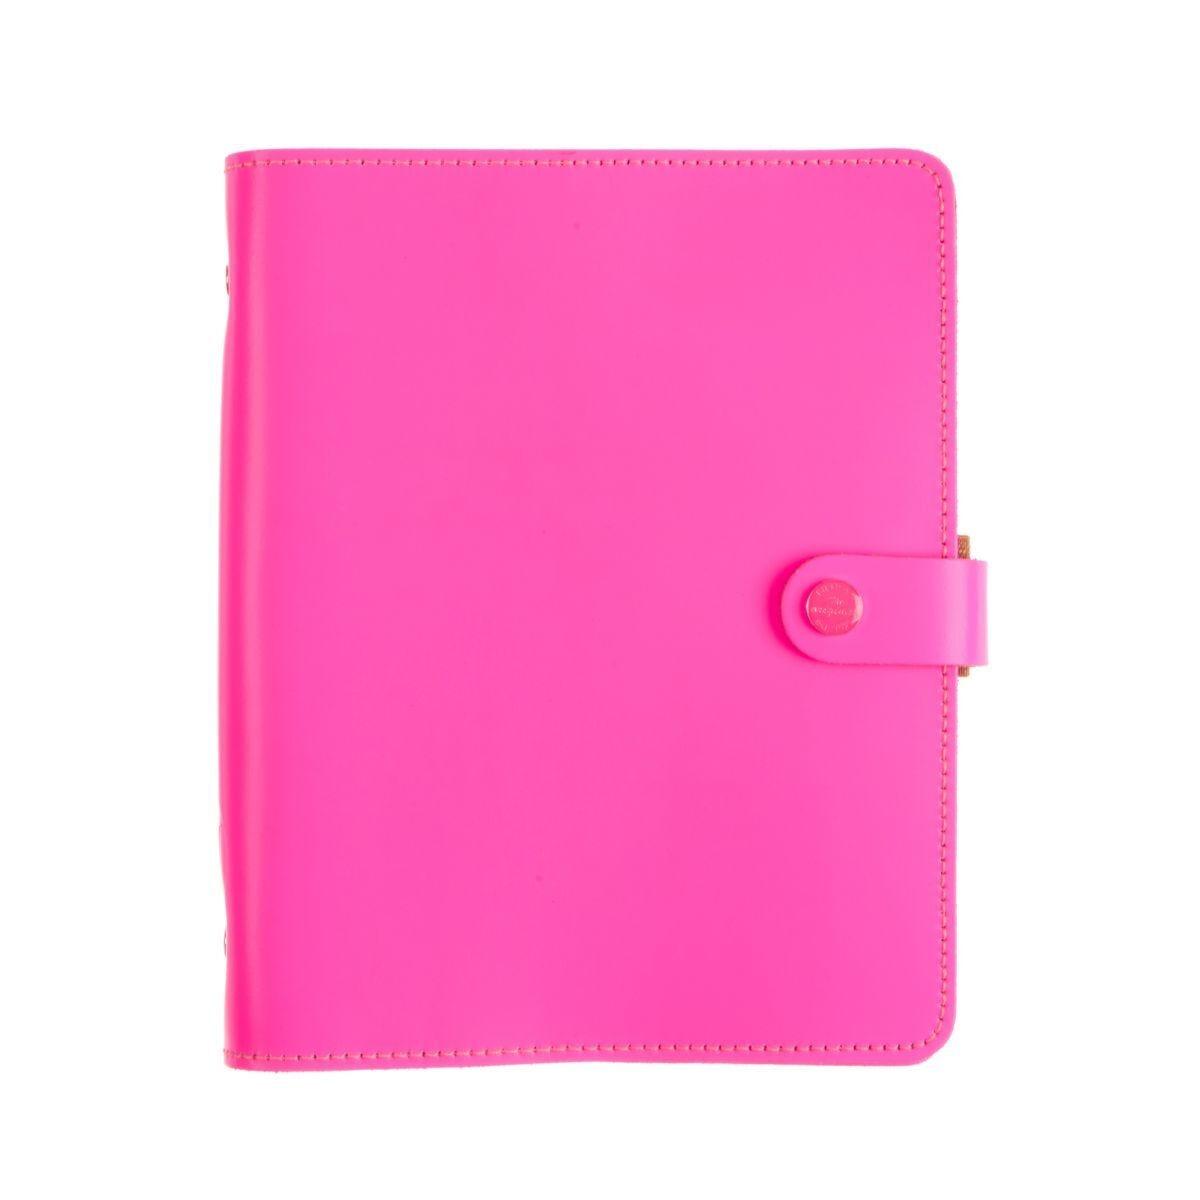 Filofax A5 Organiser Original Florescent Pink